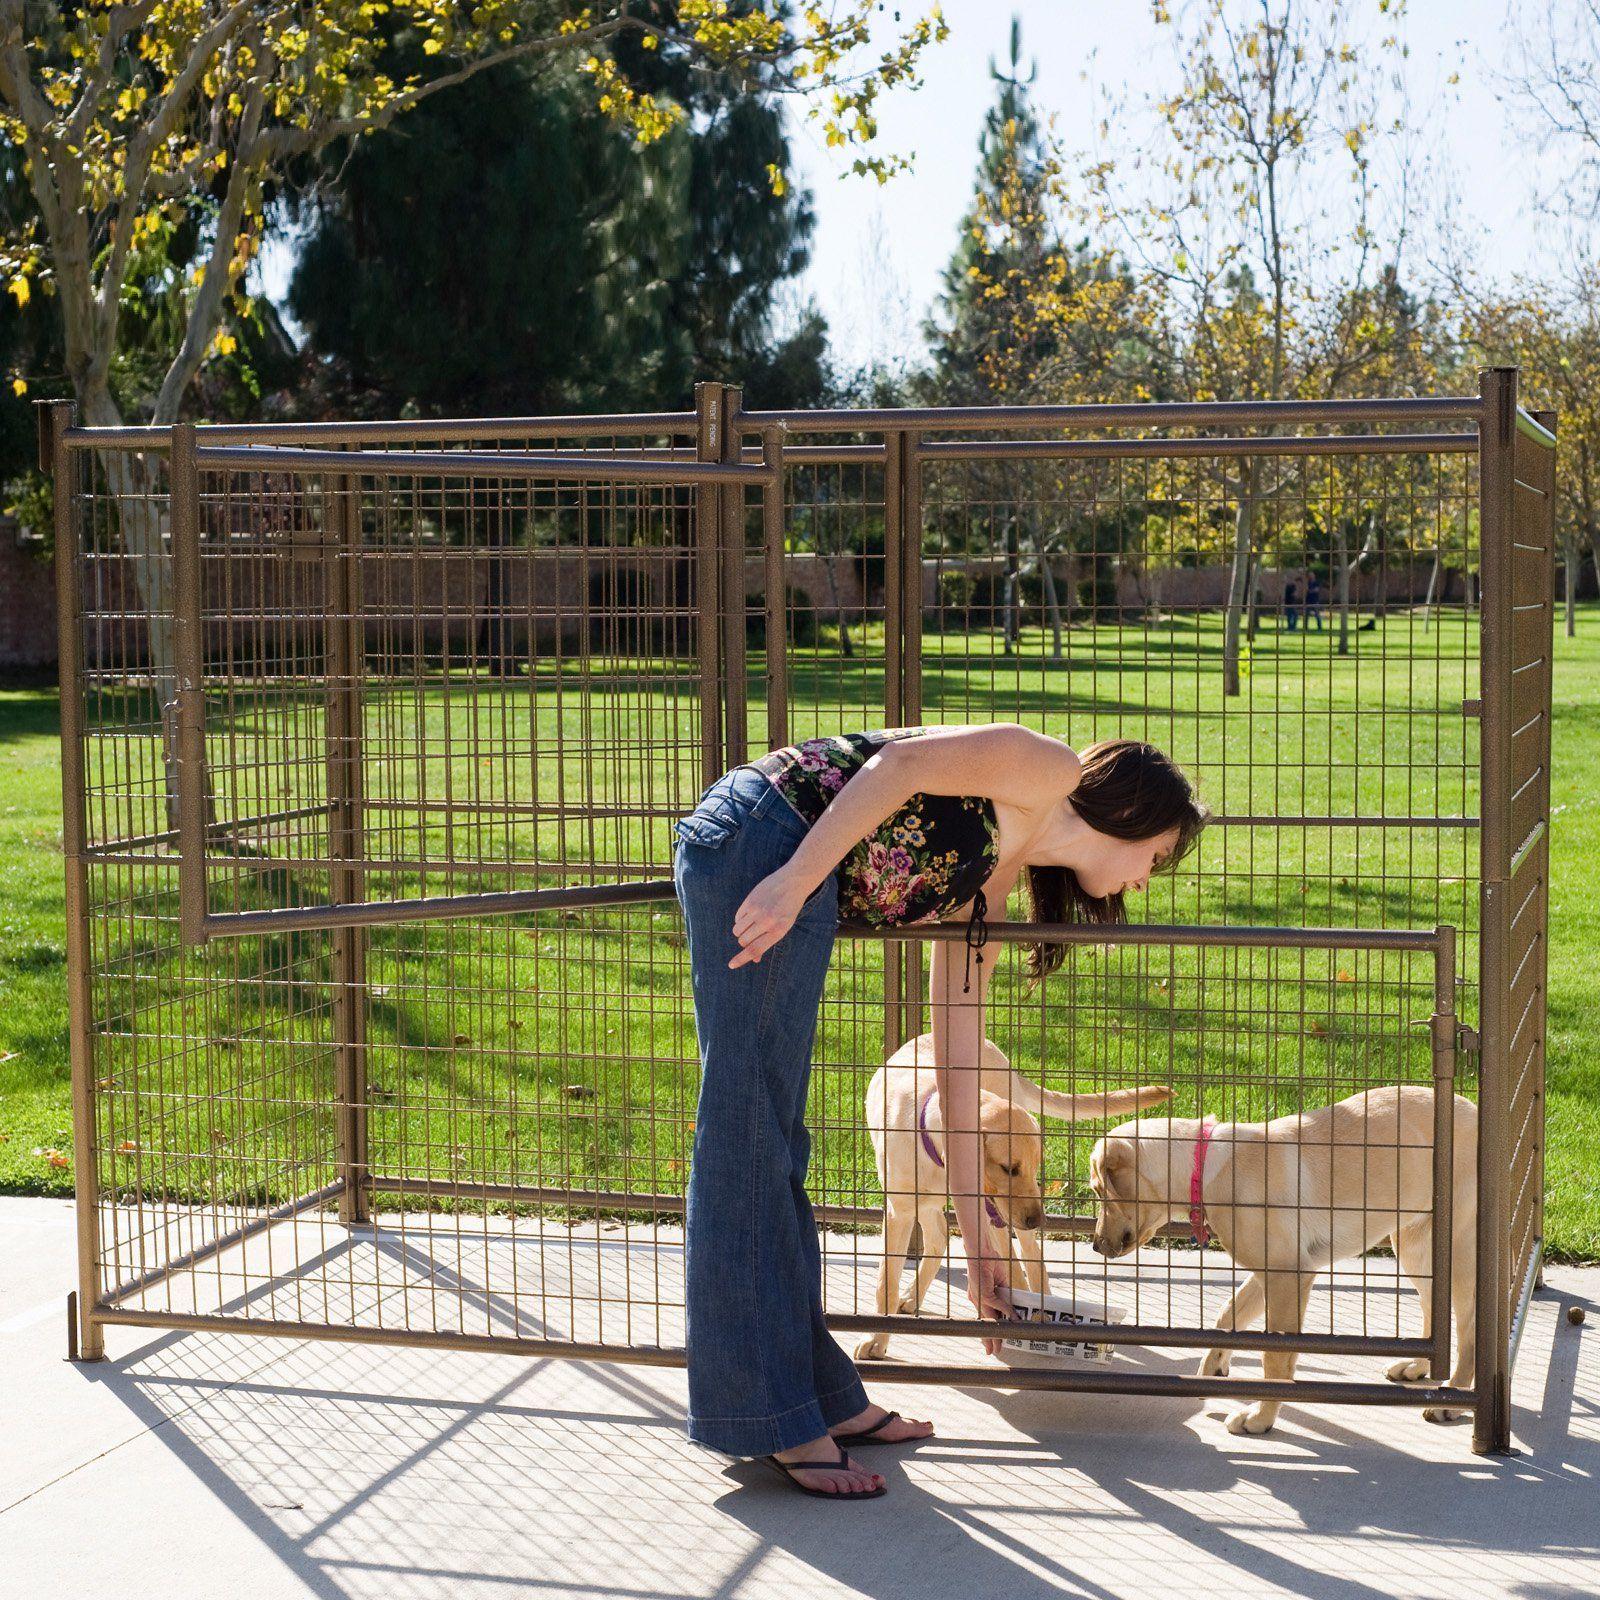 Advantek Modular Outdoor Dog Kennel from hayneedle